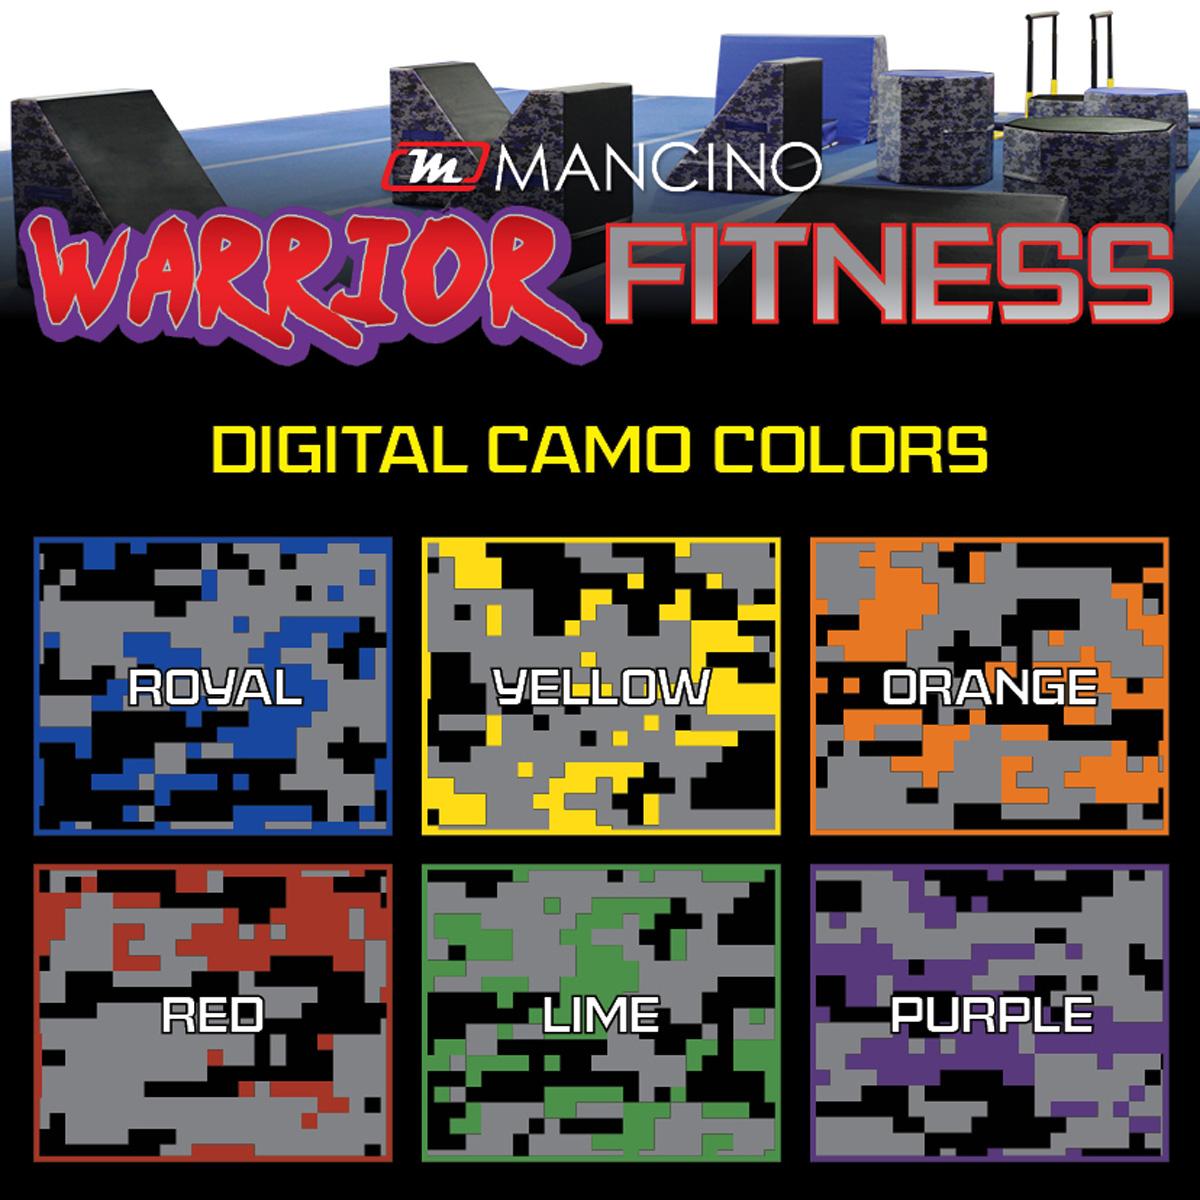 Warrior Fitness camo color options